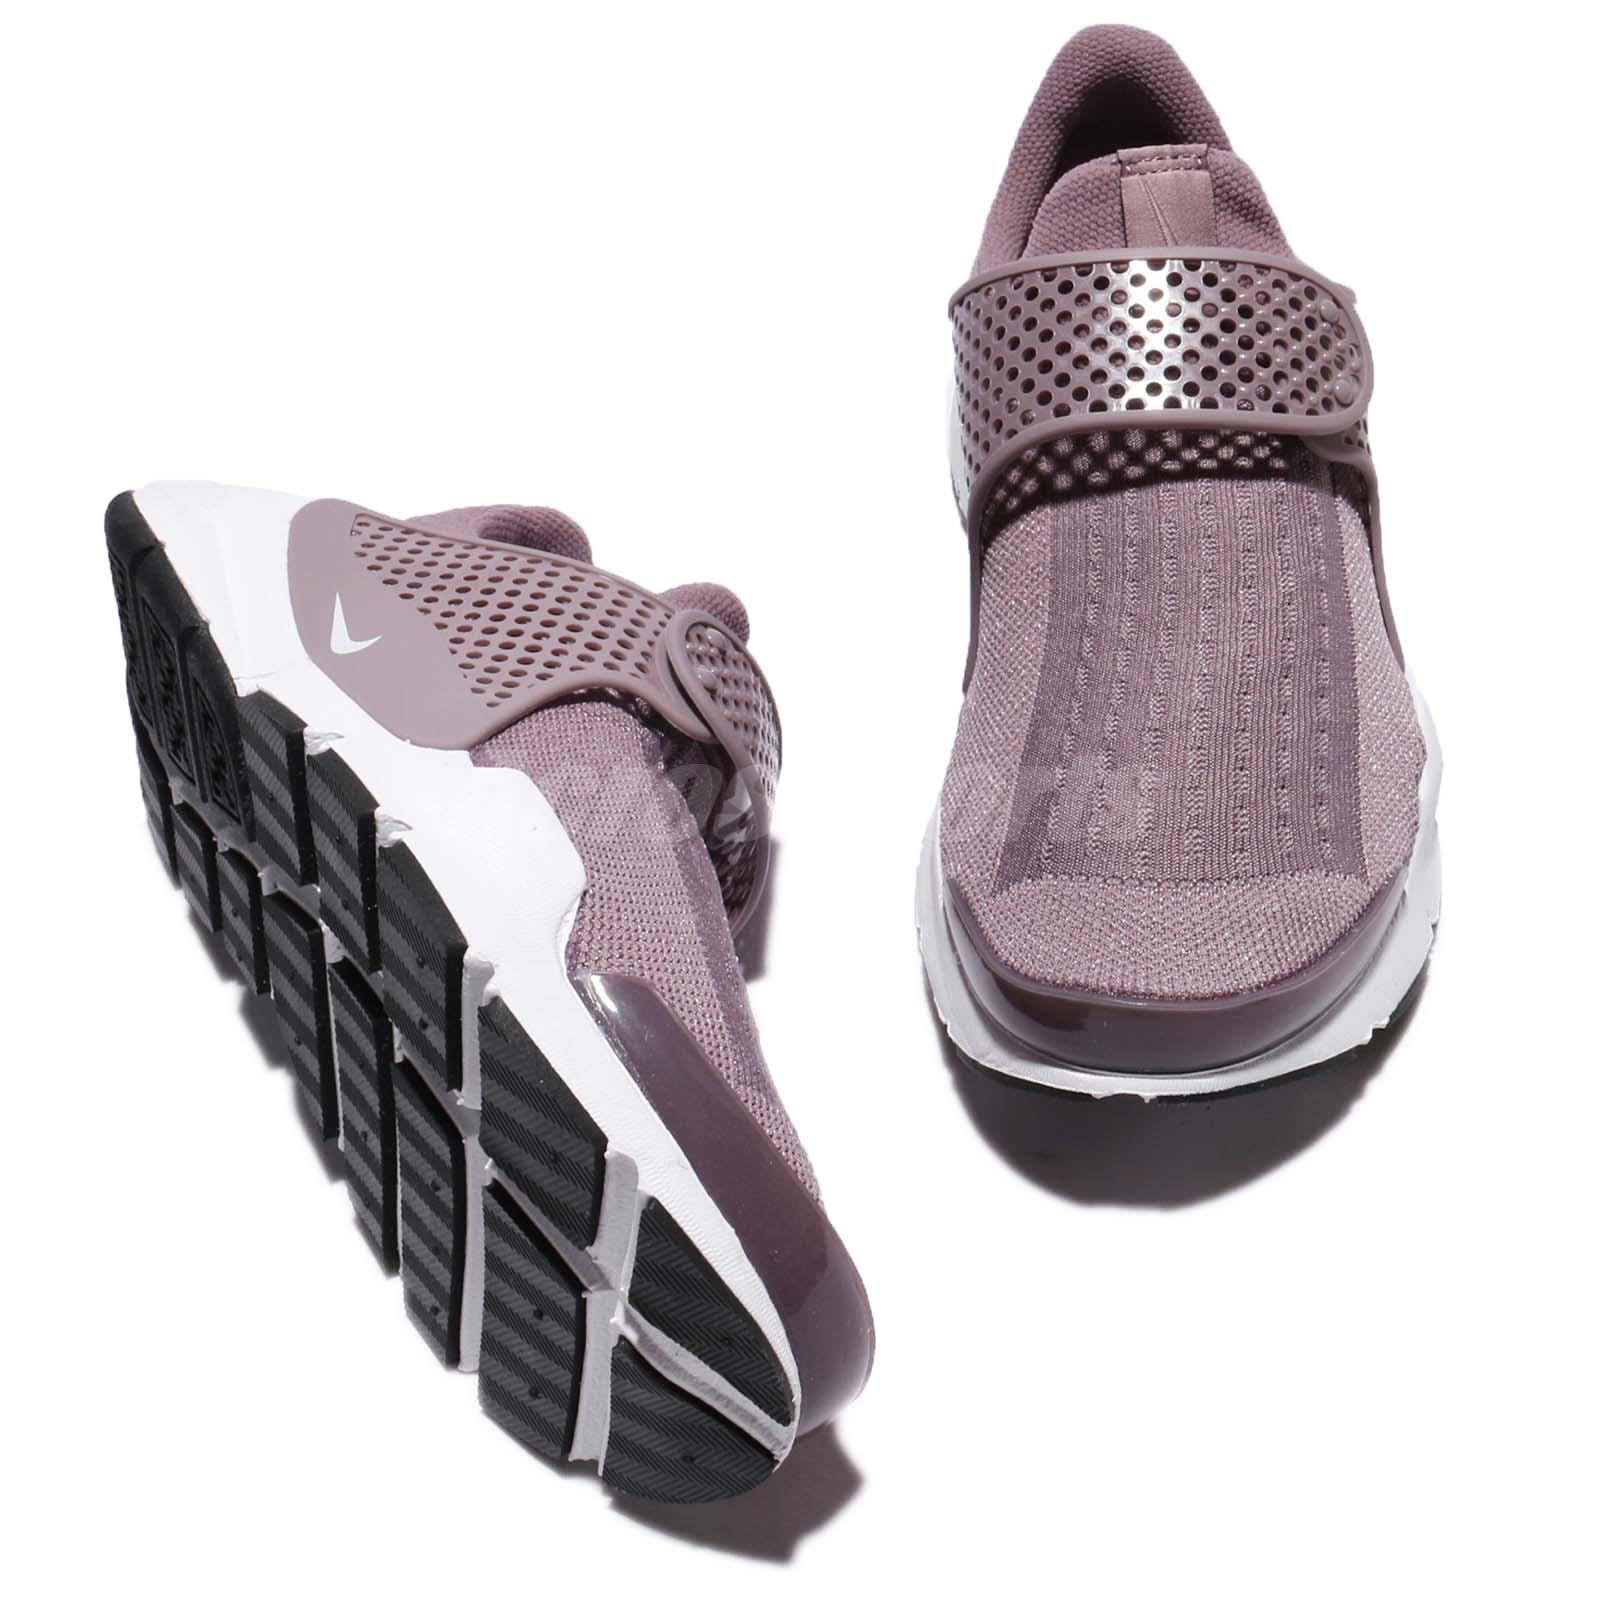 dacc02b3168bfc ... 848475 201 Taupe Grey White Black Každodenné Fialová Wmns Nike Sock Dart  Taupe Grey White Women Shoes Sneakers Sl . ...